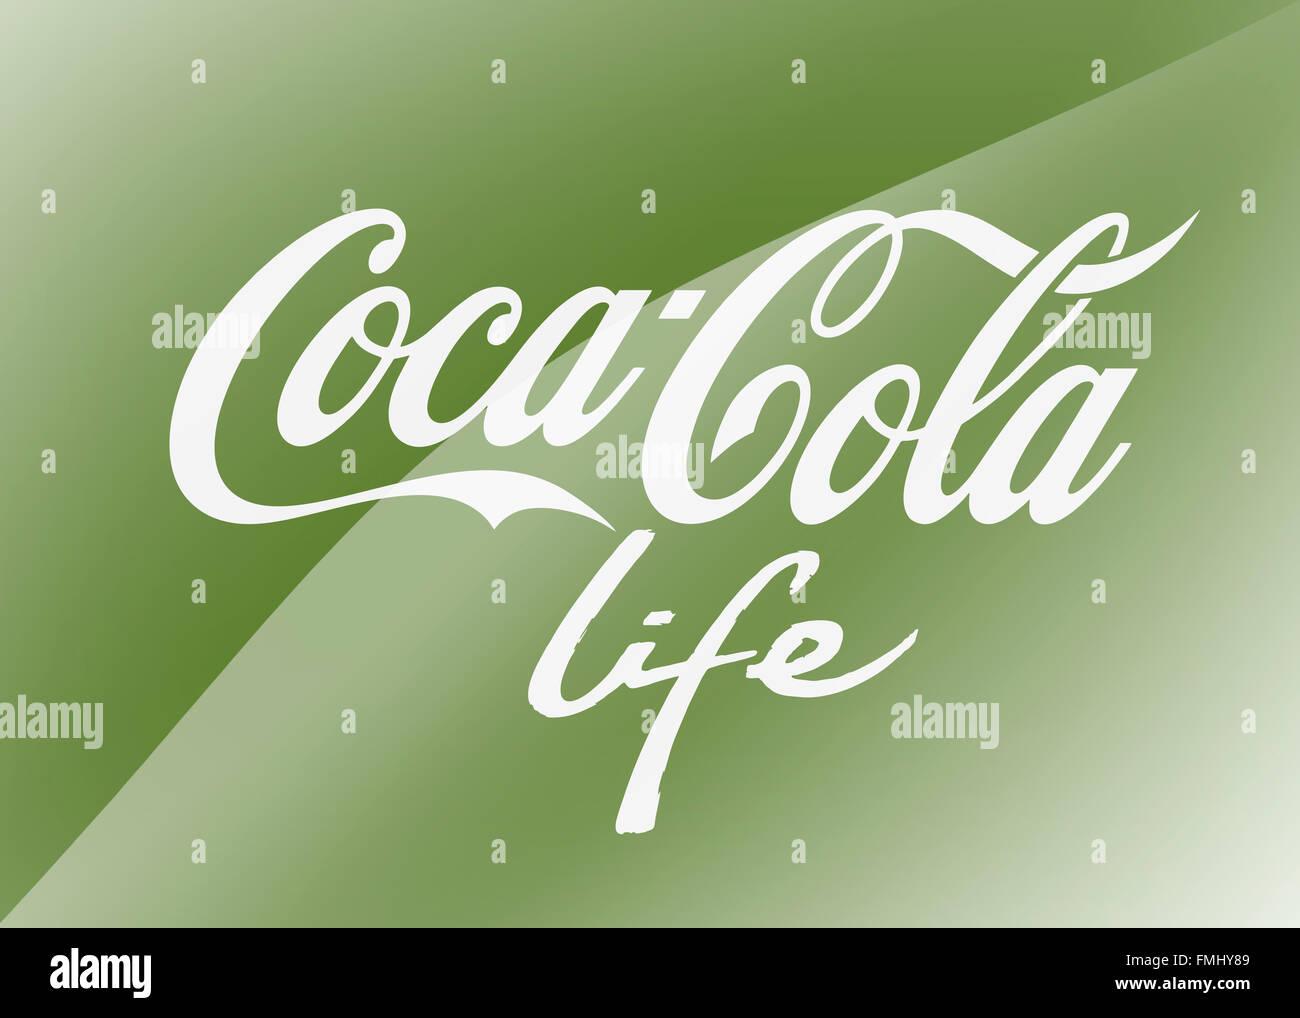 Coca Cola life logo Stock Photo